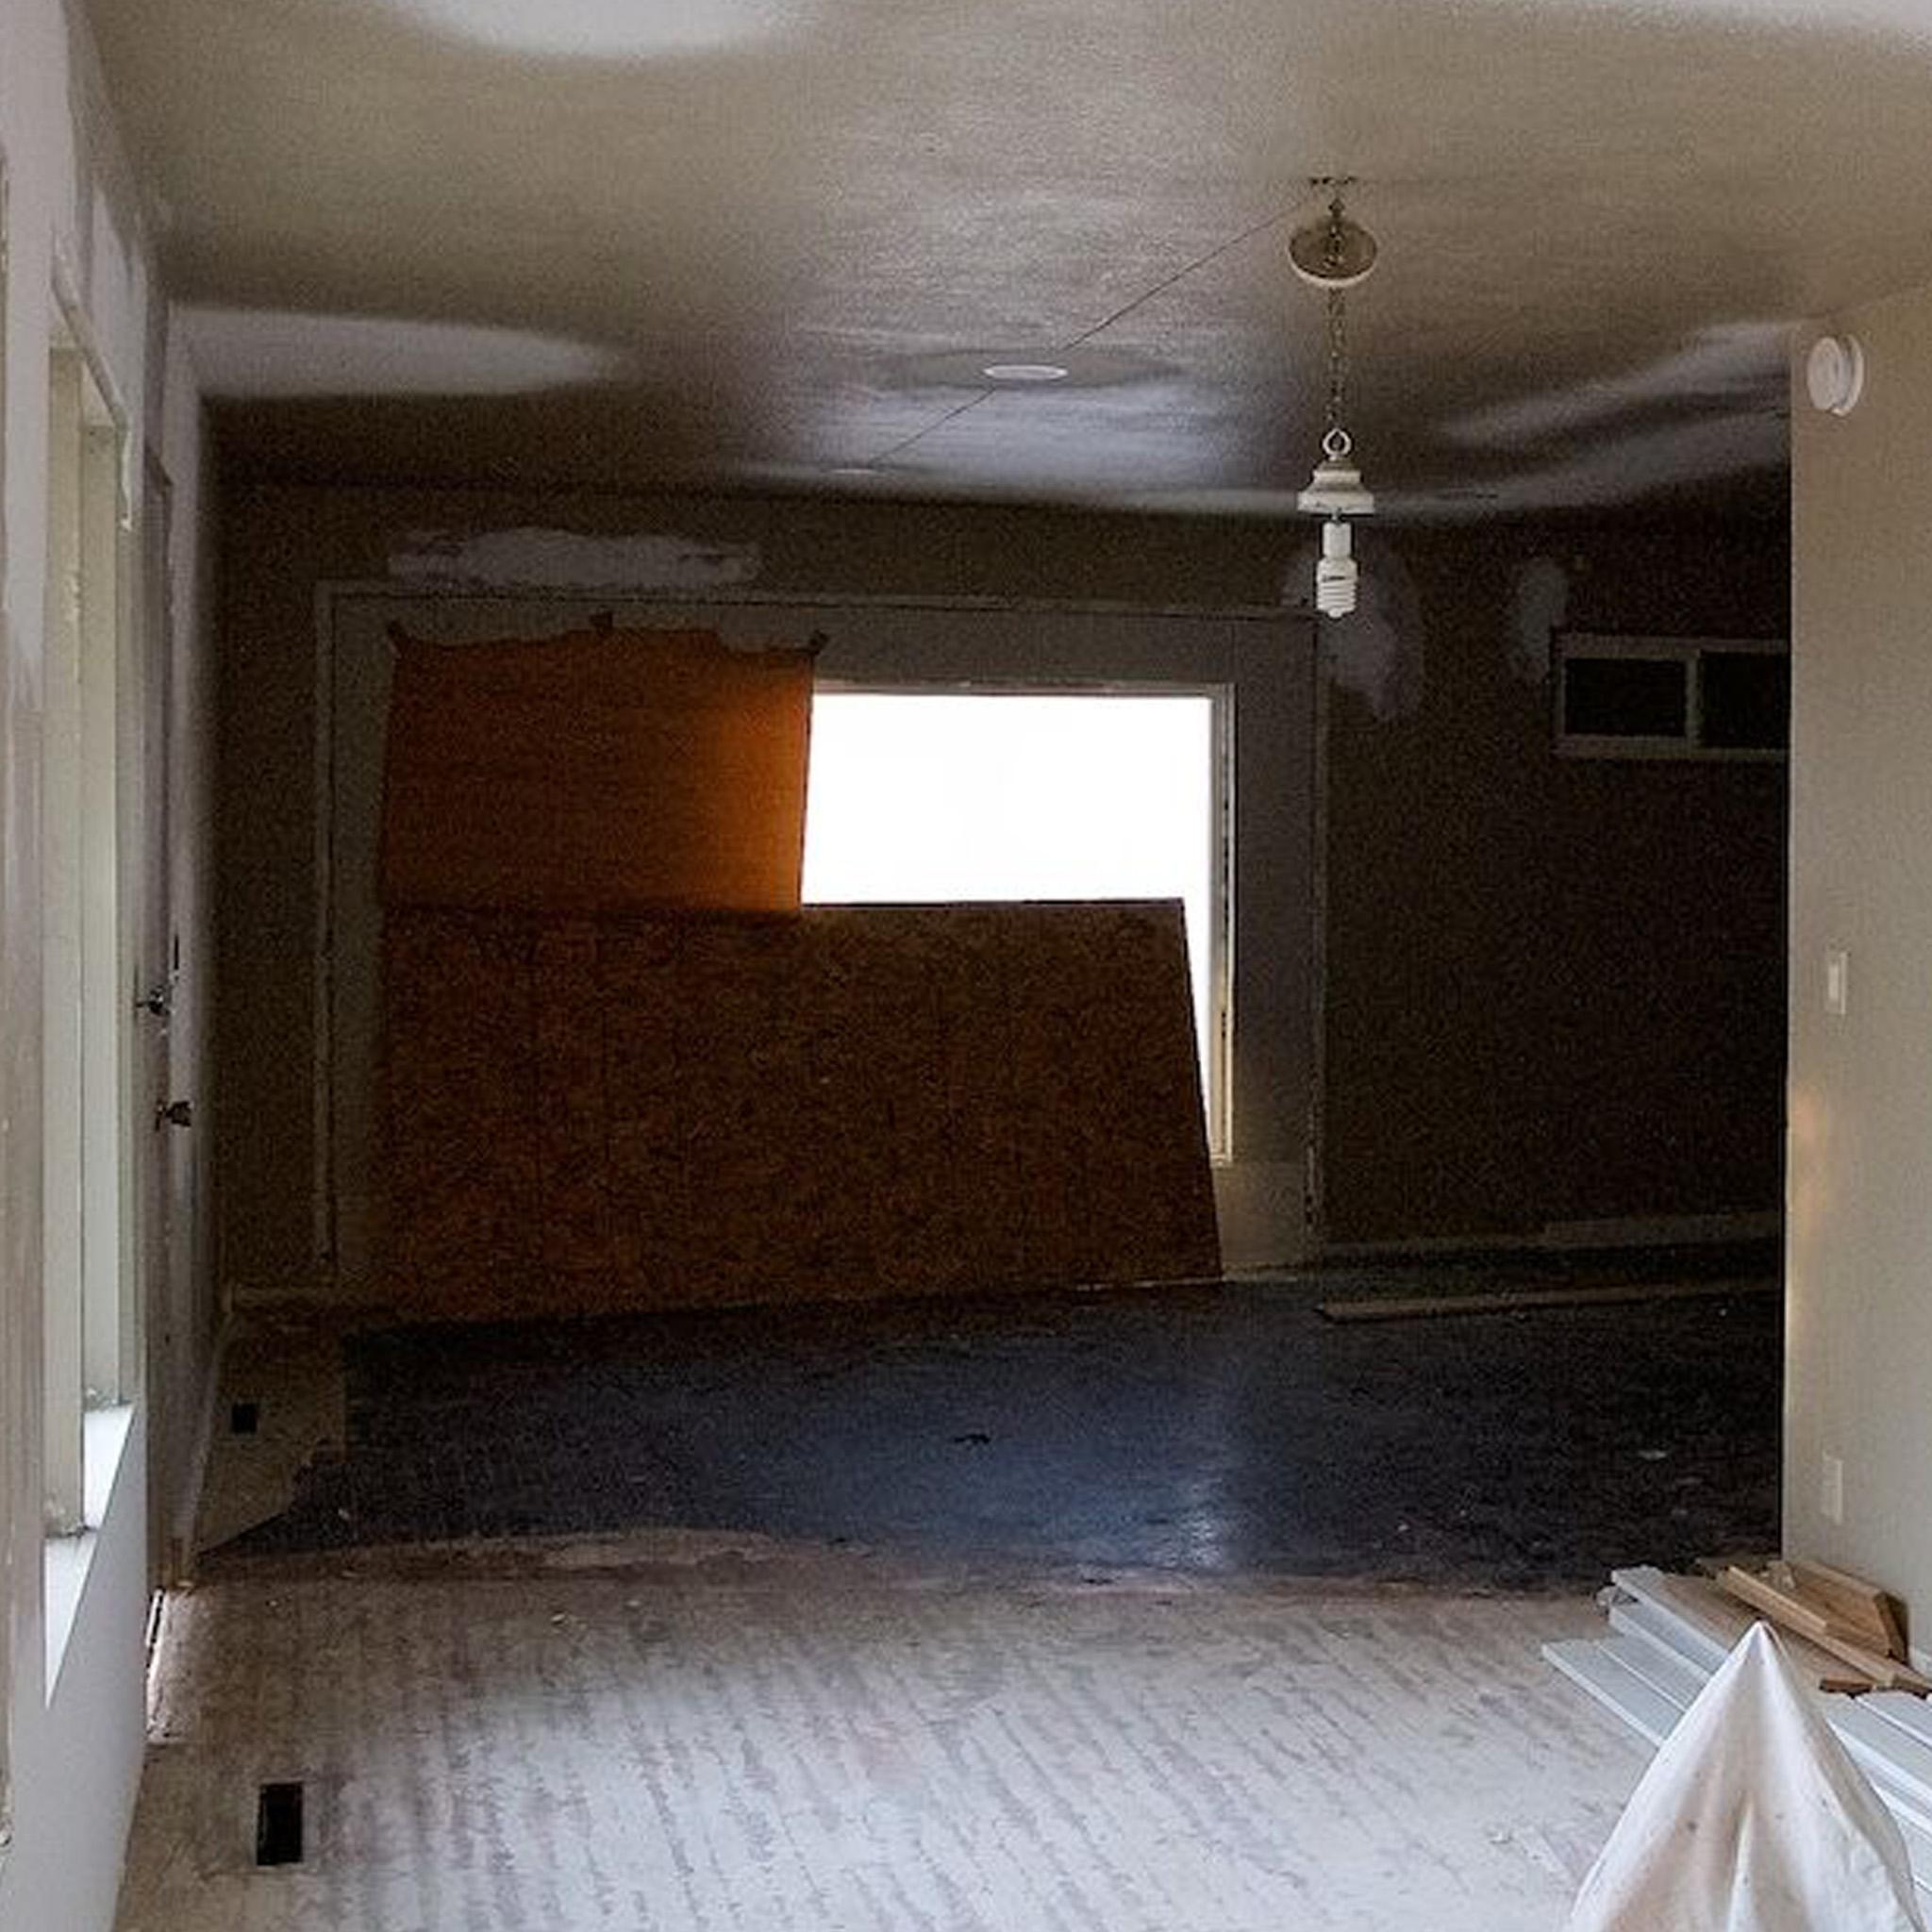 S2E04 - The Mural House_0003_Layer 42.jpg